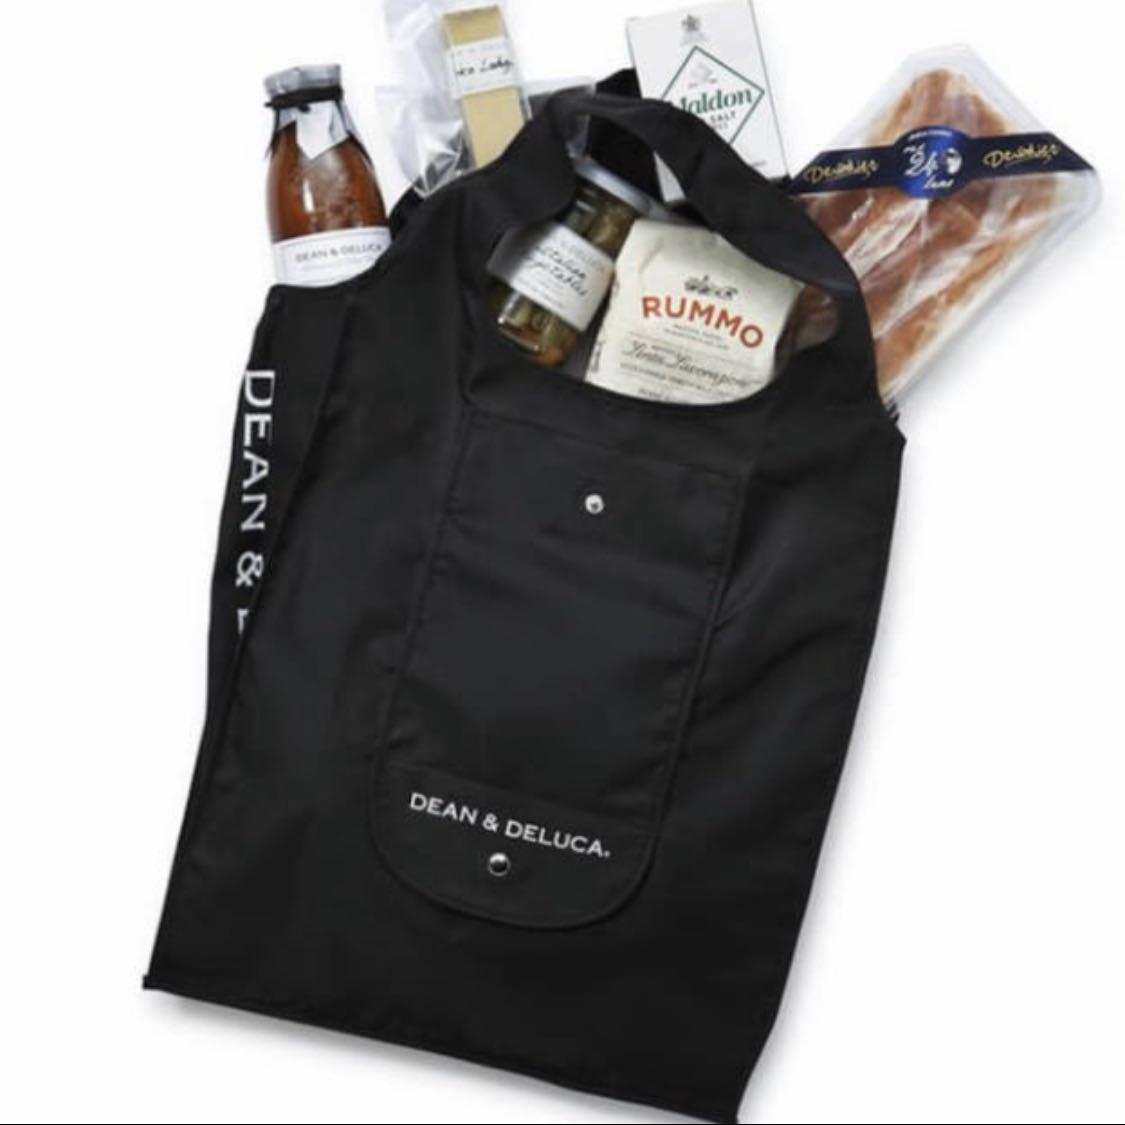 DEAN&DELUCA エコバッグ ブラック 黒 ショッピングバッグ トートバッグ ディーン&デルーカ サブバッグ マザーズバッグ ランチバッグ 正規品